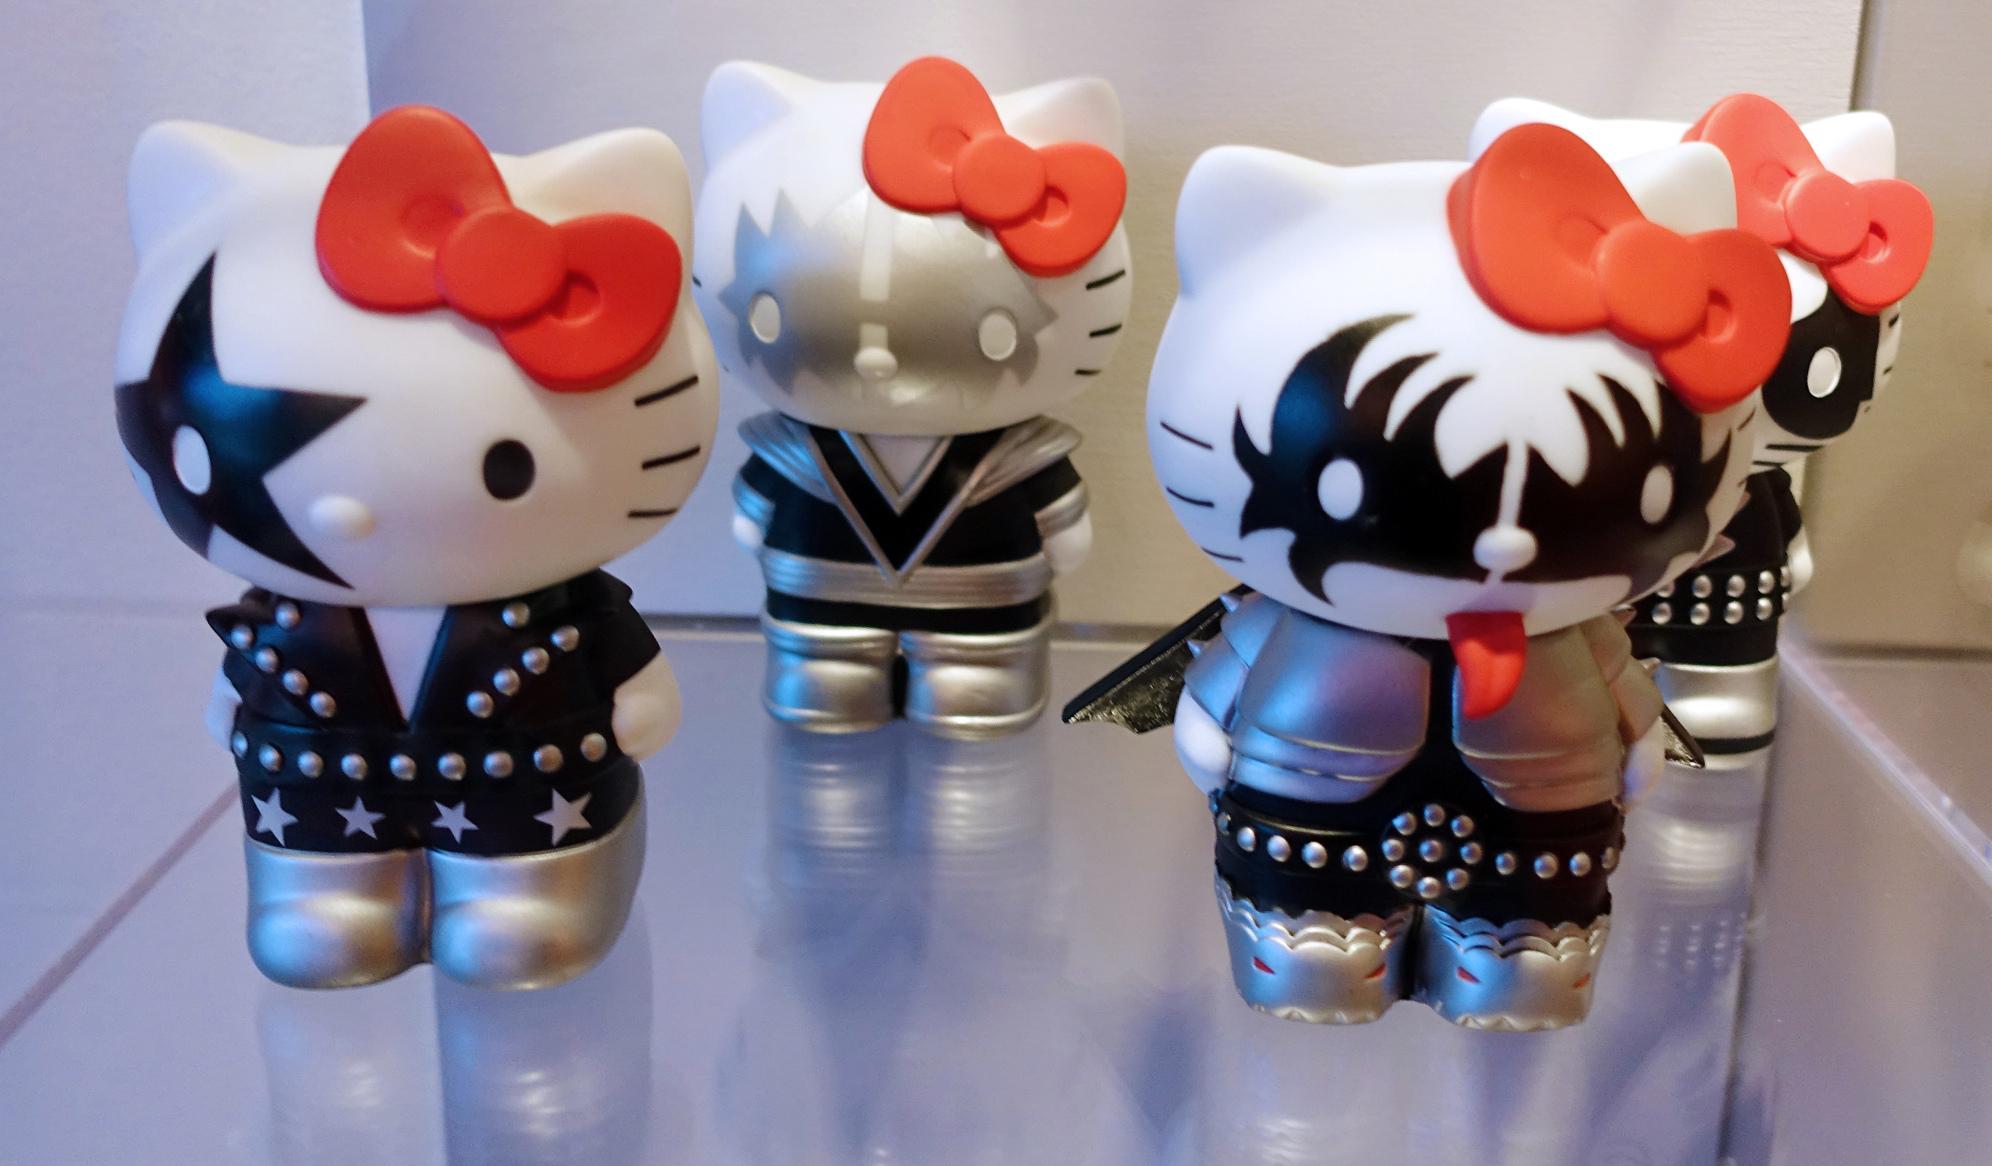 Supercute World of Hello Kitty